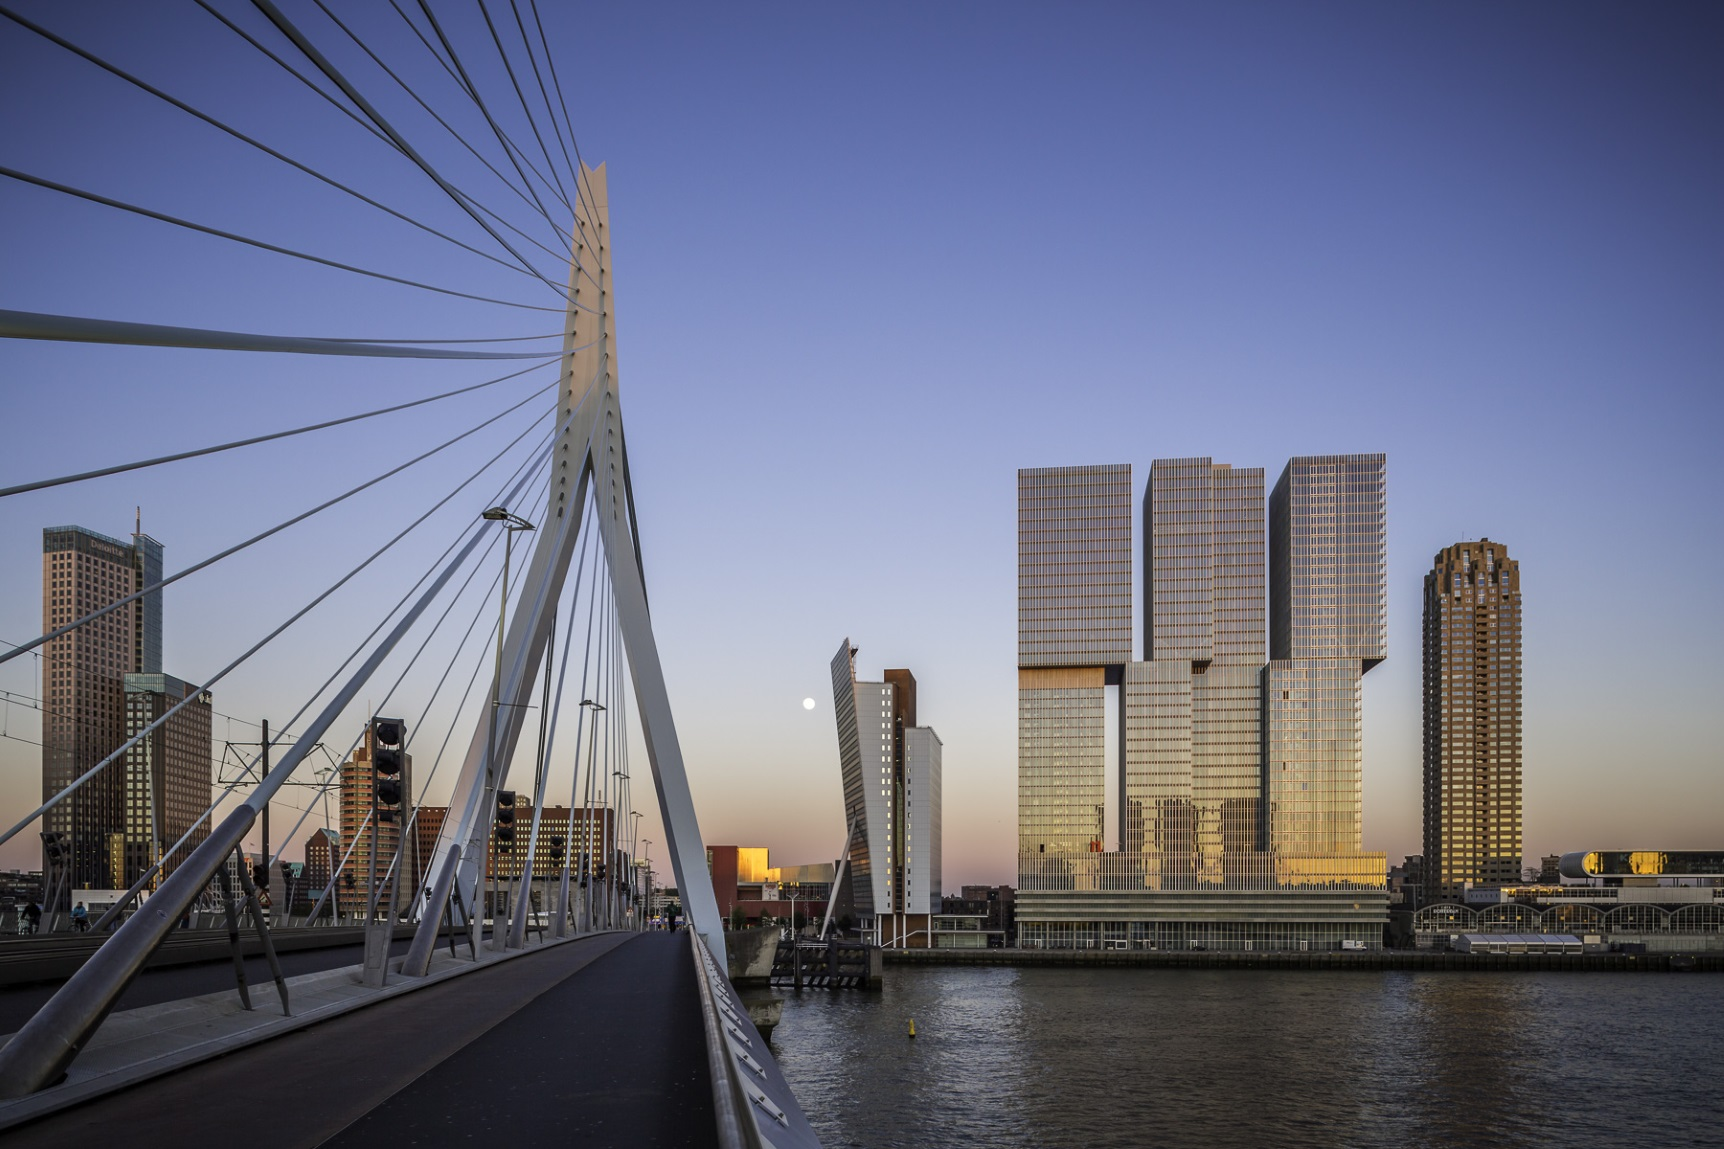 rotterdam-skyline-from-erasmus-bridge-mabry-campbell-lr